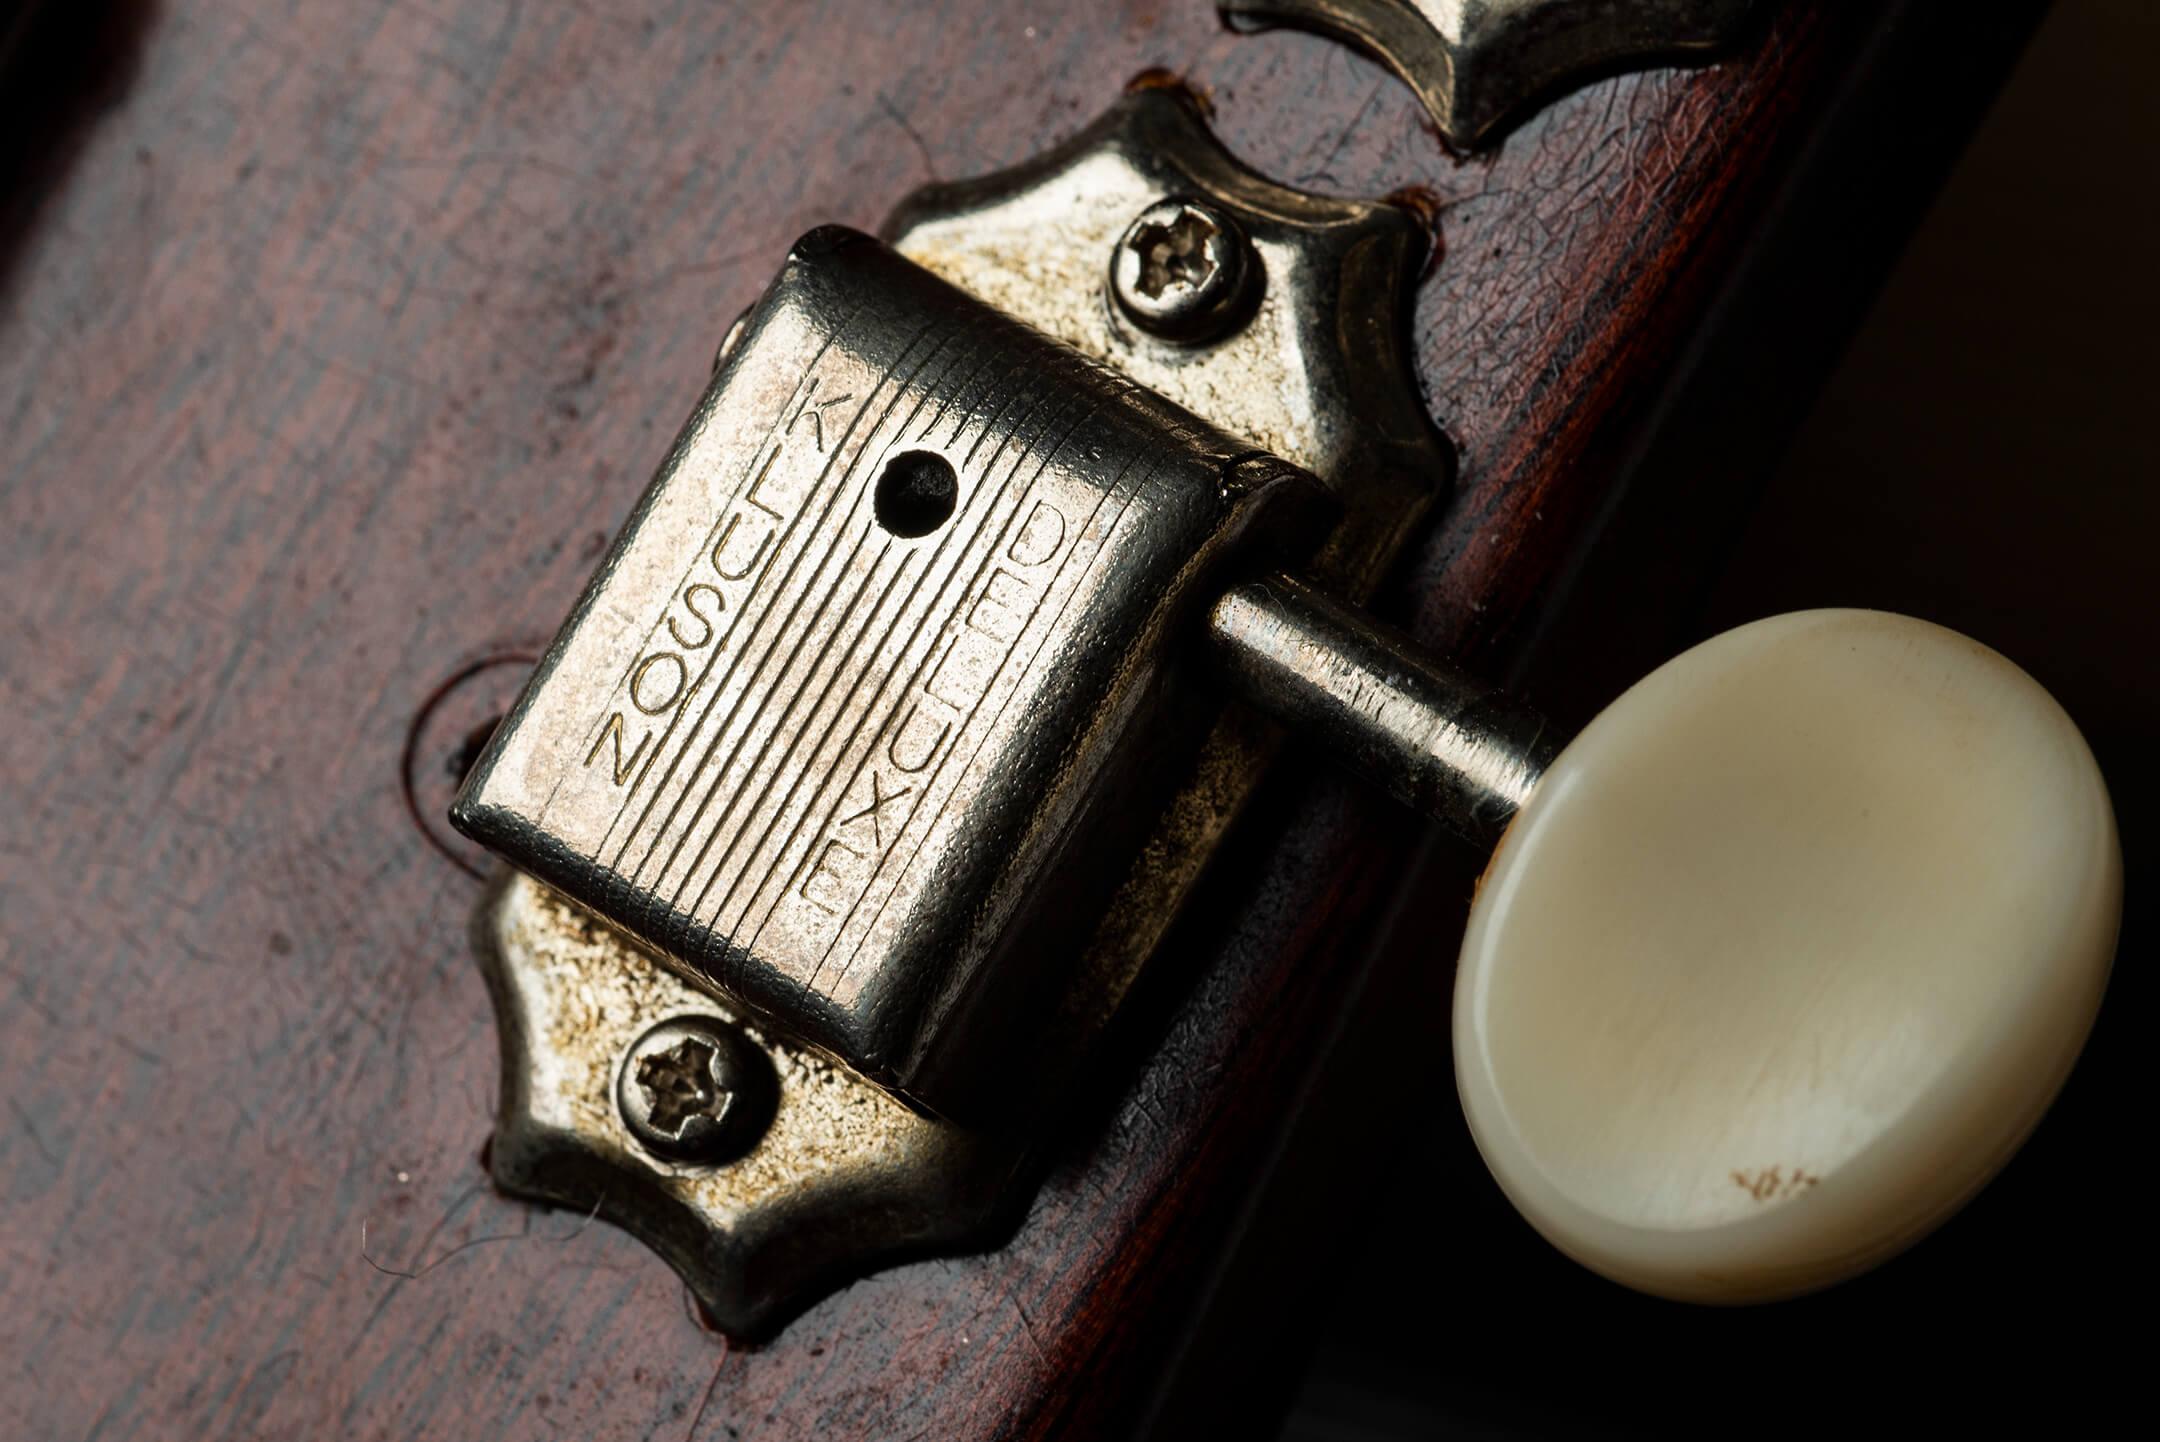 Vintage Bench Test: Gibson 1969 Es-330 'Long Neck' Tuner